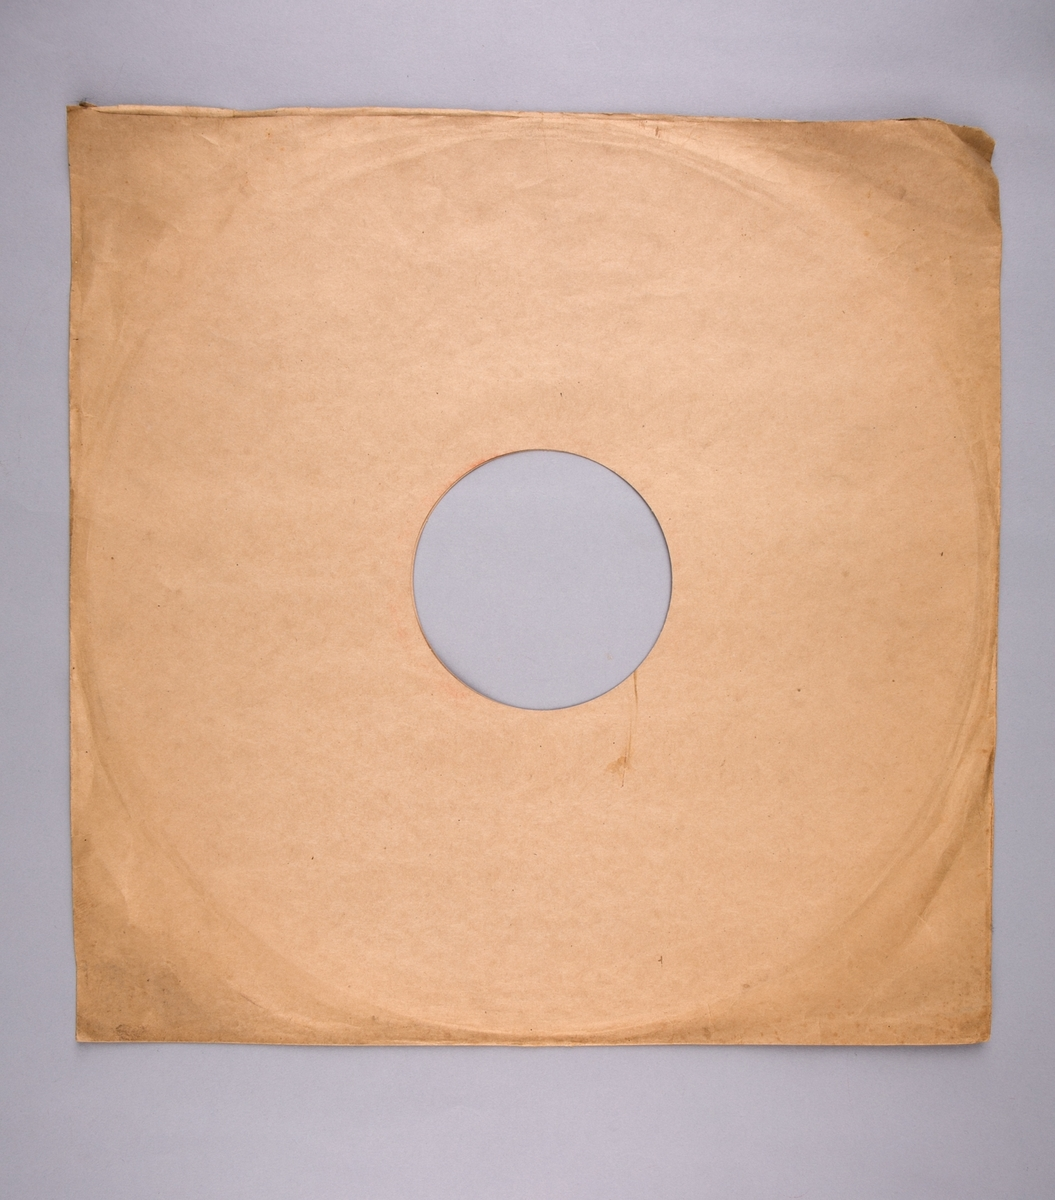 "Grammofonplatesamling. Plateomslag til vinylplate med tittel ""Armed Forces Radio Service"" utgitt av War and Navy Departements."